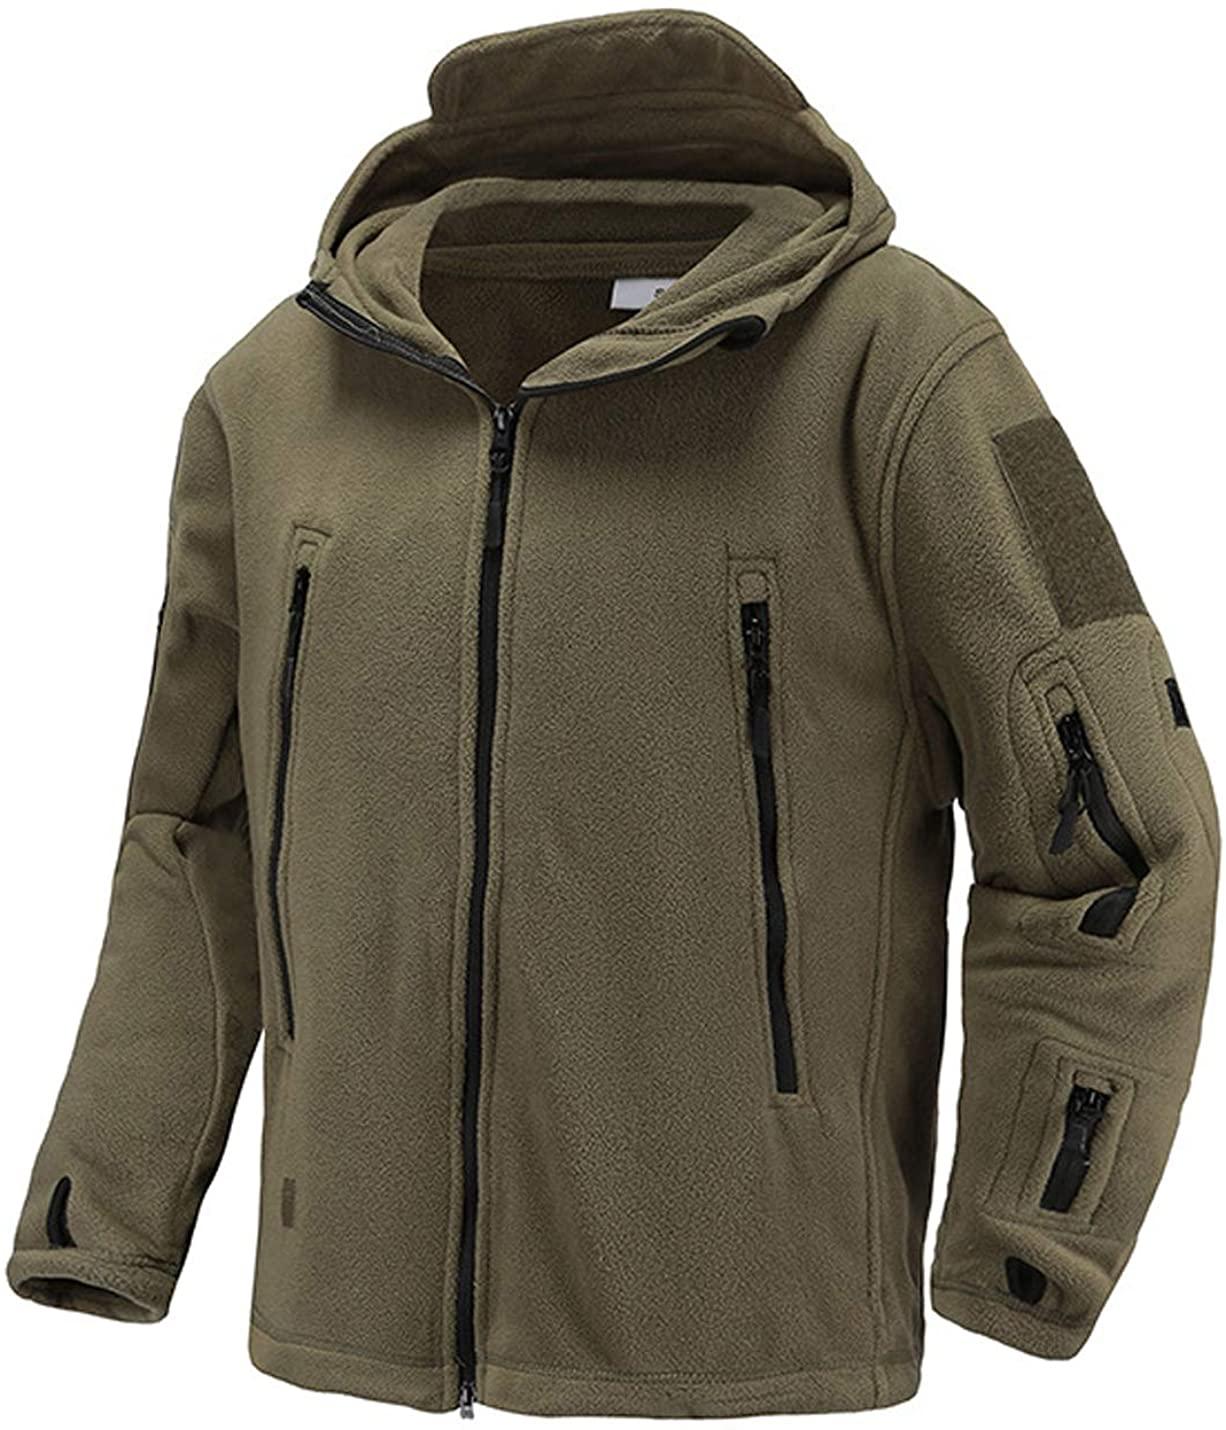 D.B.M Mens Classic Plus Velvet Warm Outdoor Hooded Zip Pocket Sports Jacket